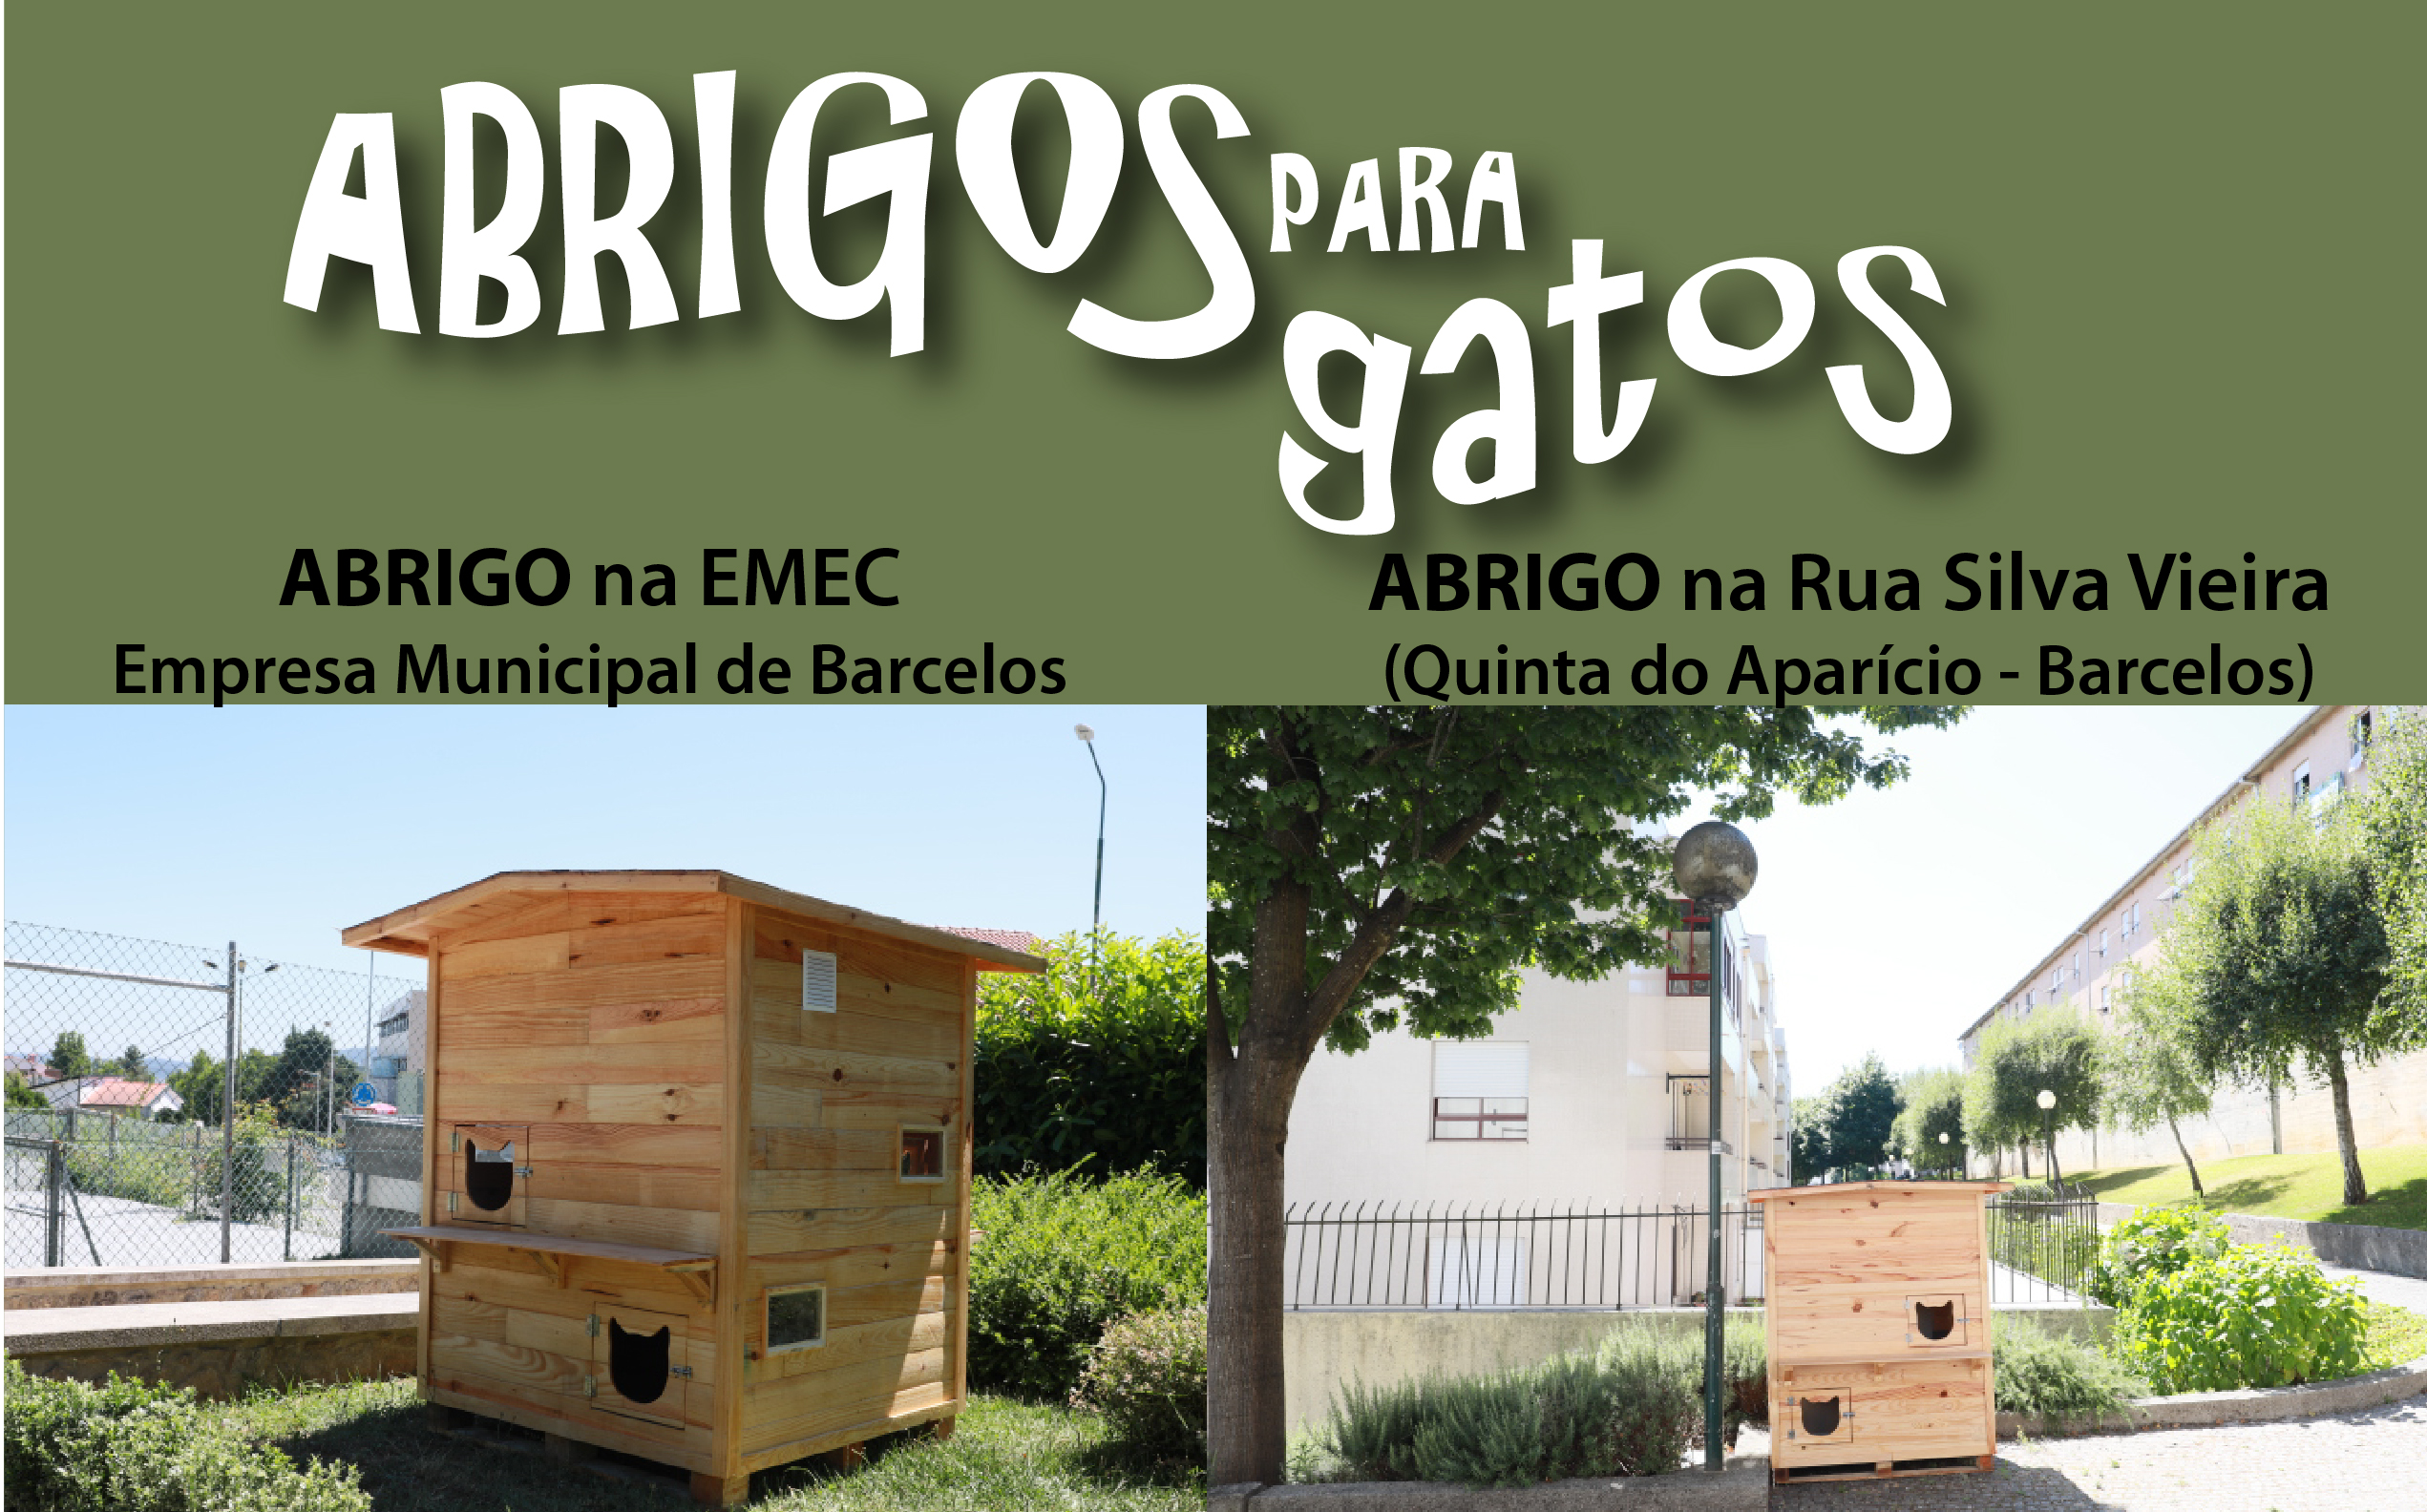 Município de Barcelos cria abrigos para controlar colónias de gatos